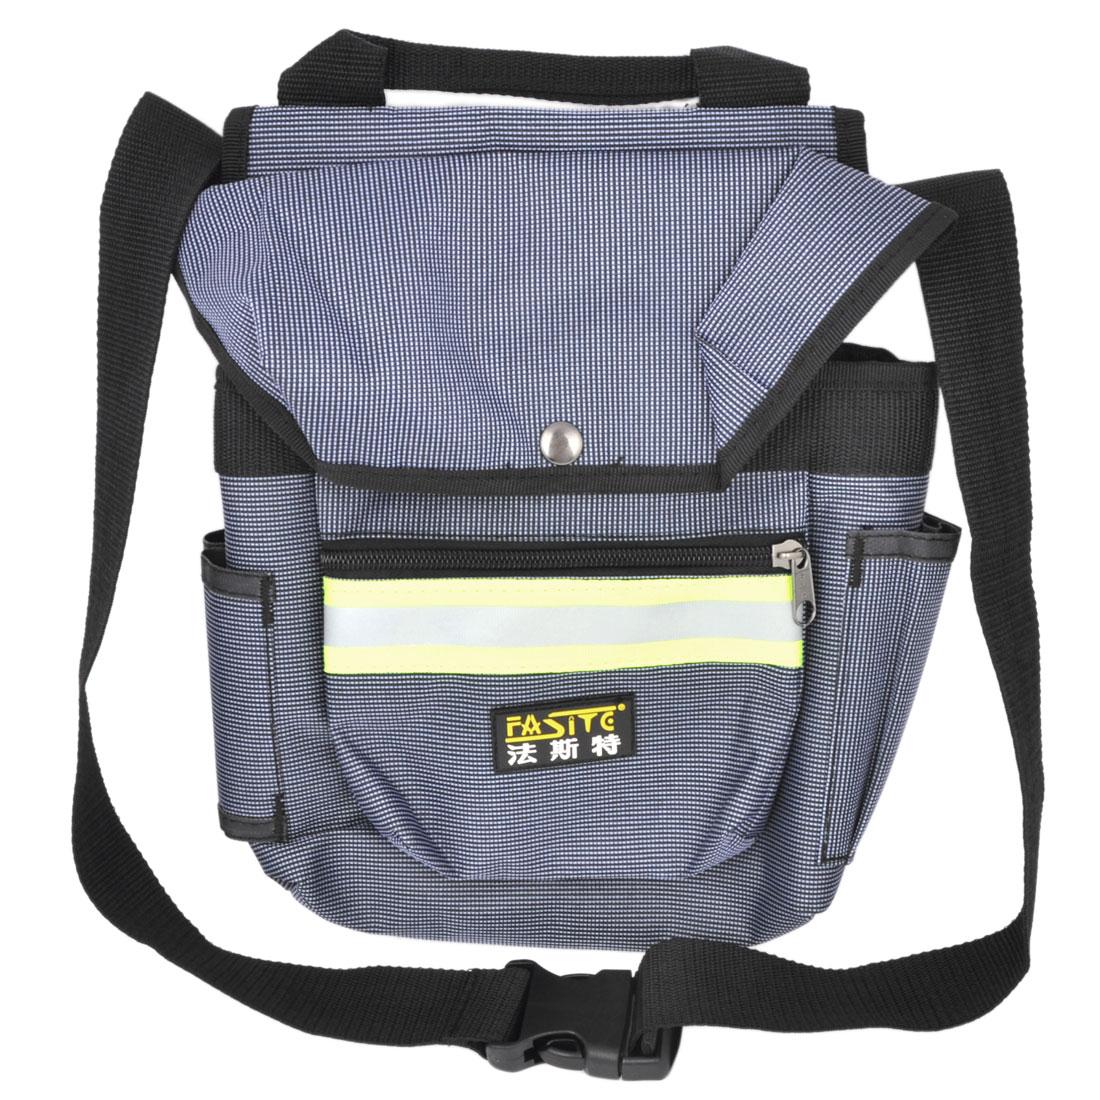 Blue Grid Printed Nylon Oxford Pliers Scissors Tool Holder Bag